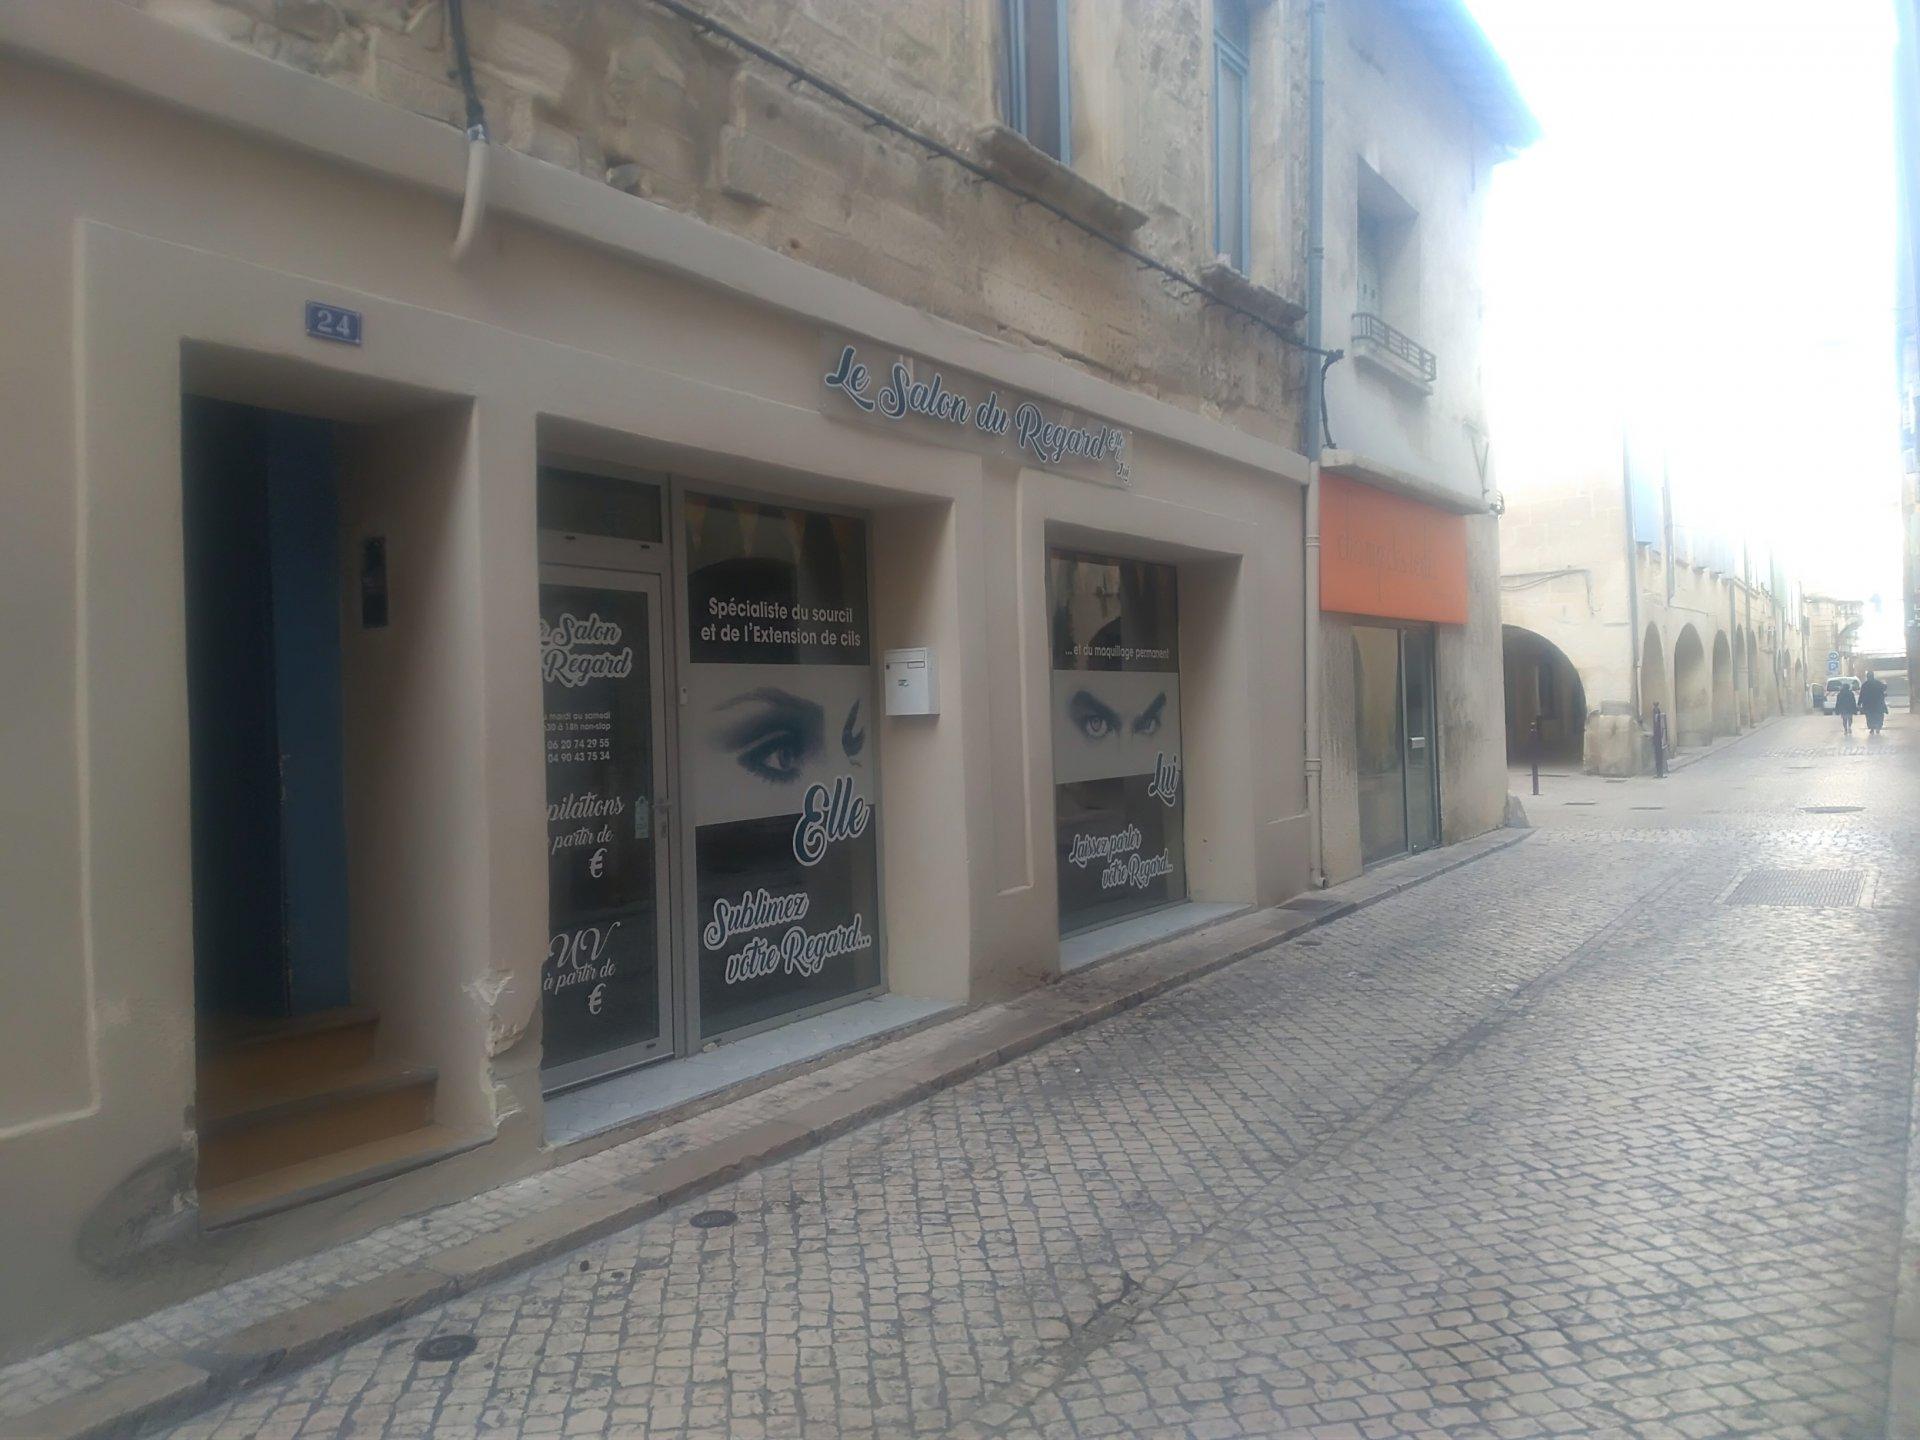 Local rue des halles